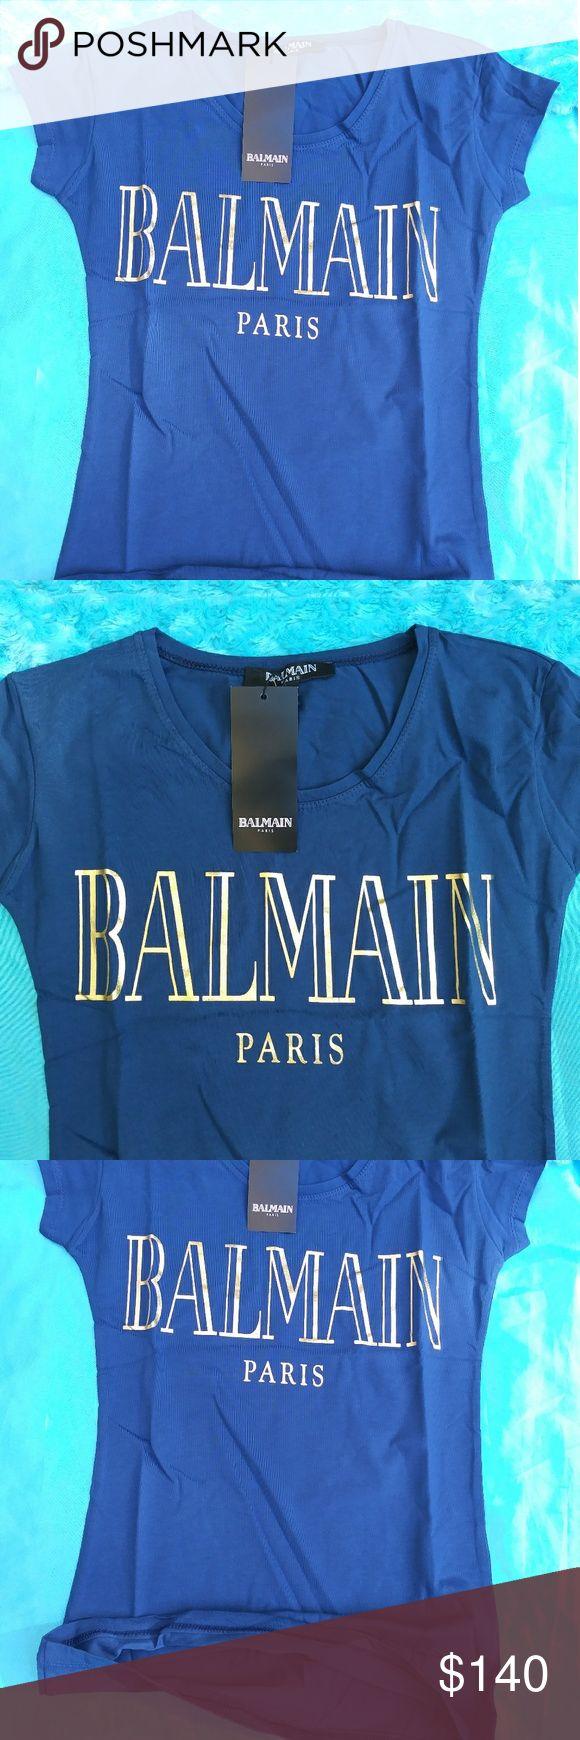 Memorial day sale BALMAIN women  tshirt Inventory 20% off Balmain exclusive women tshirt Brand new in package with tag Balmain Tops Tees - Short Sleeve